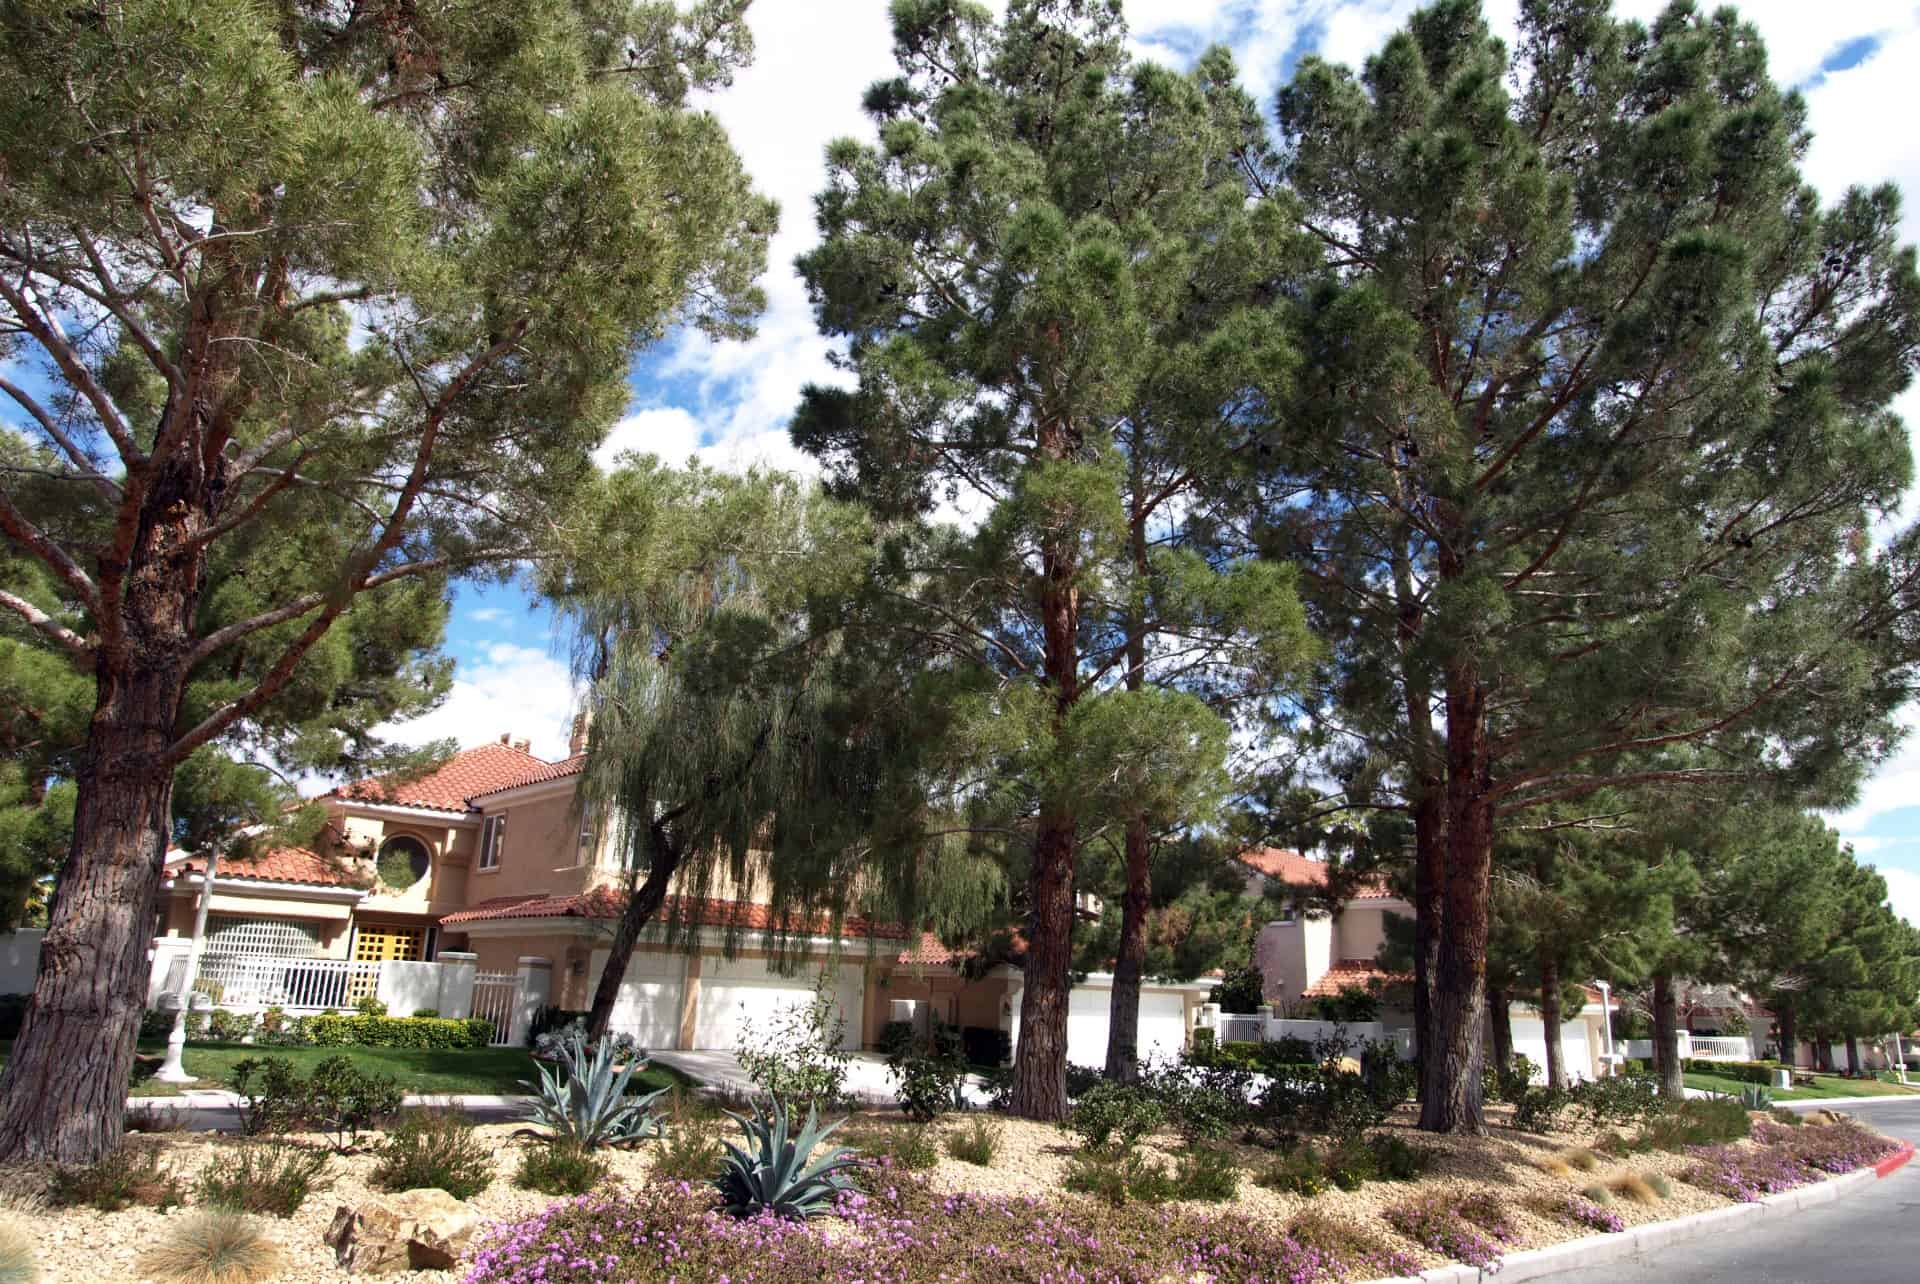 spanish-trail-rob-jensen-company-guard-gated-real-estate-summerlin-las-vegas-henderson-12